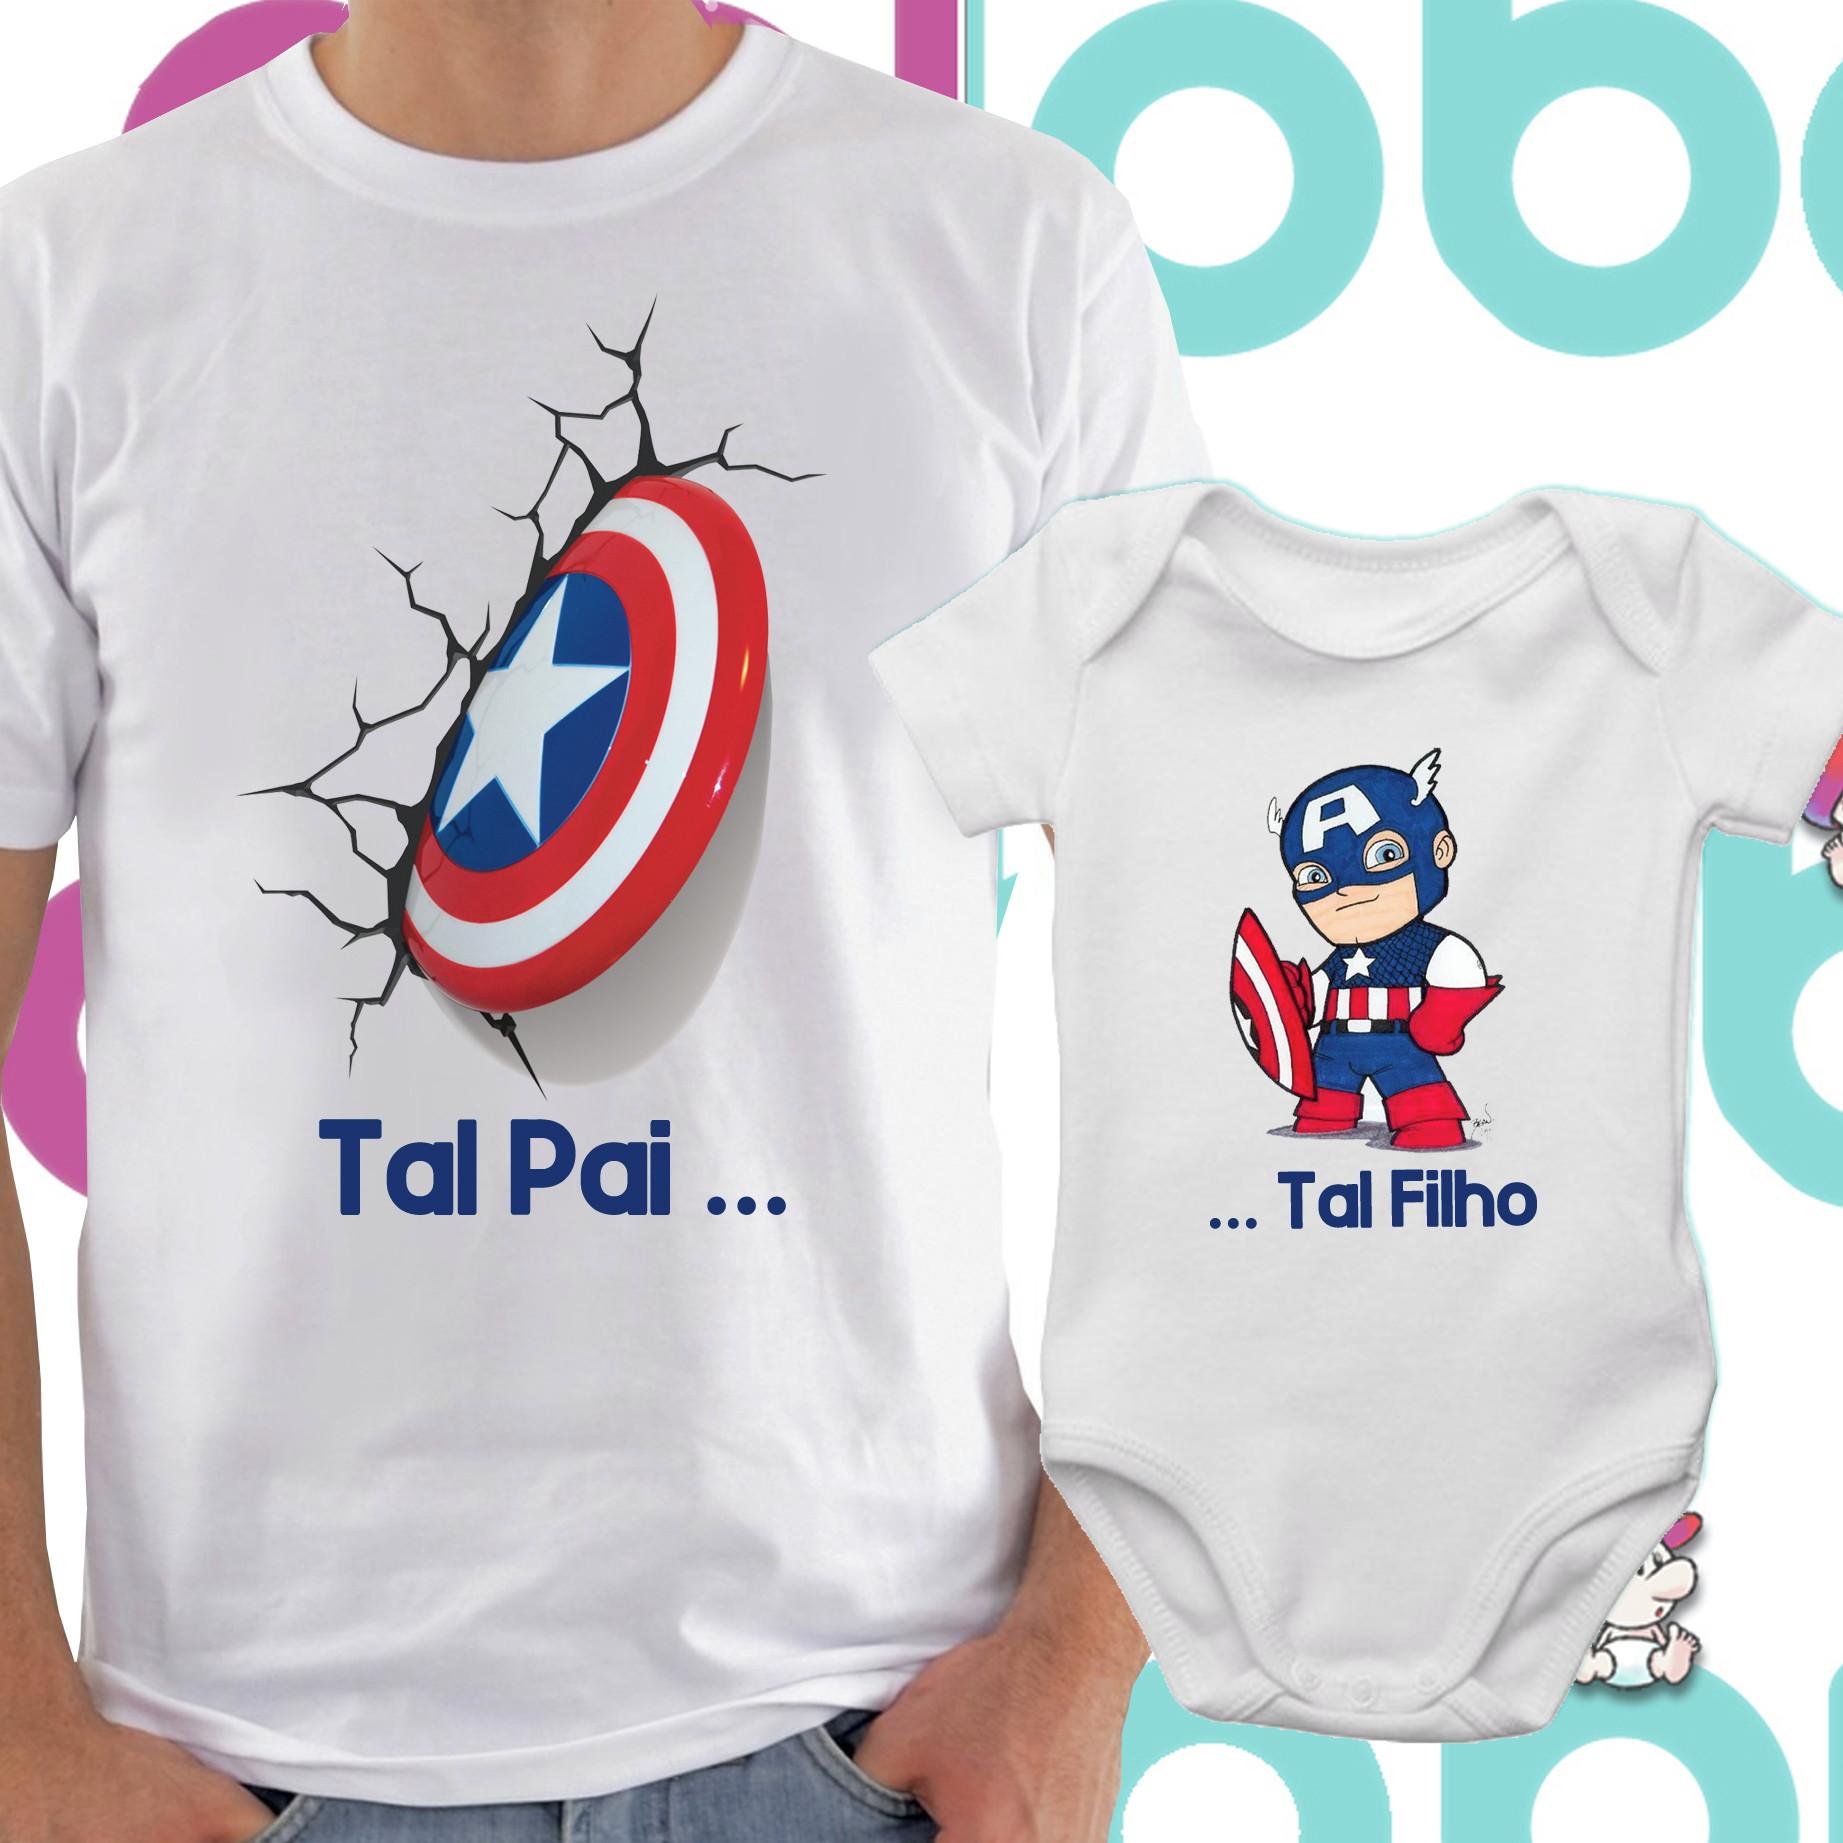 ed98b631b6c483 Body e Camiseta Tal Pai Tal Filho Capitao America